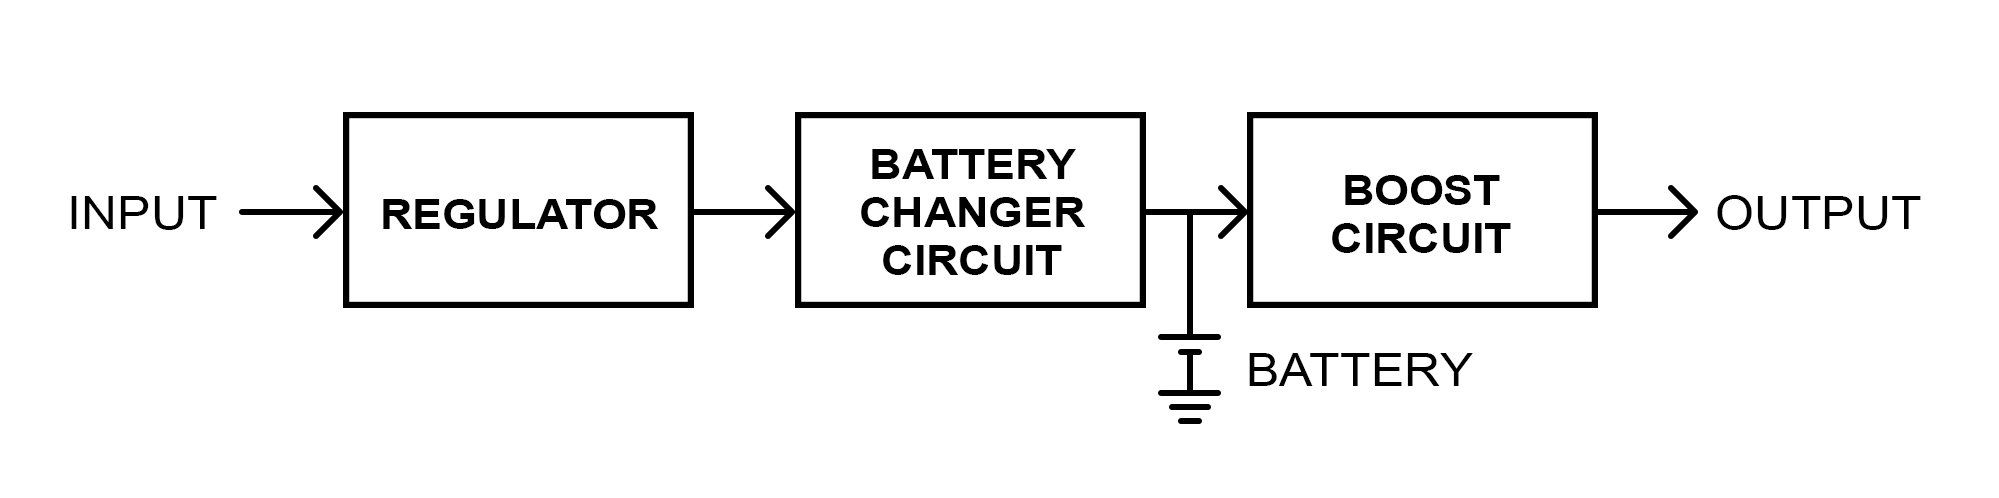 Raspberry_Pi_Lithium_Batteries_DP_MP_image1.jpg